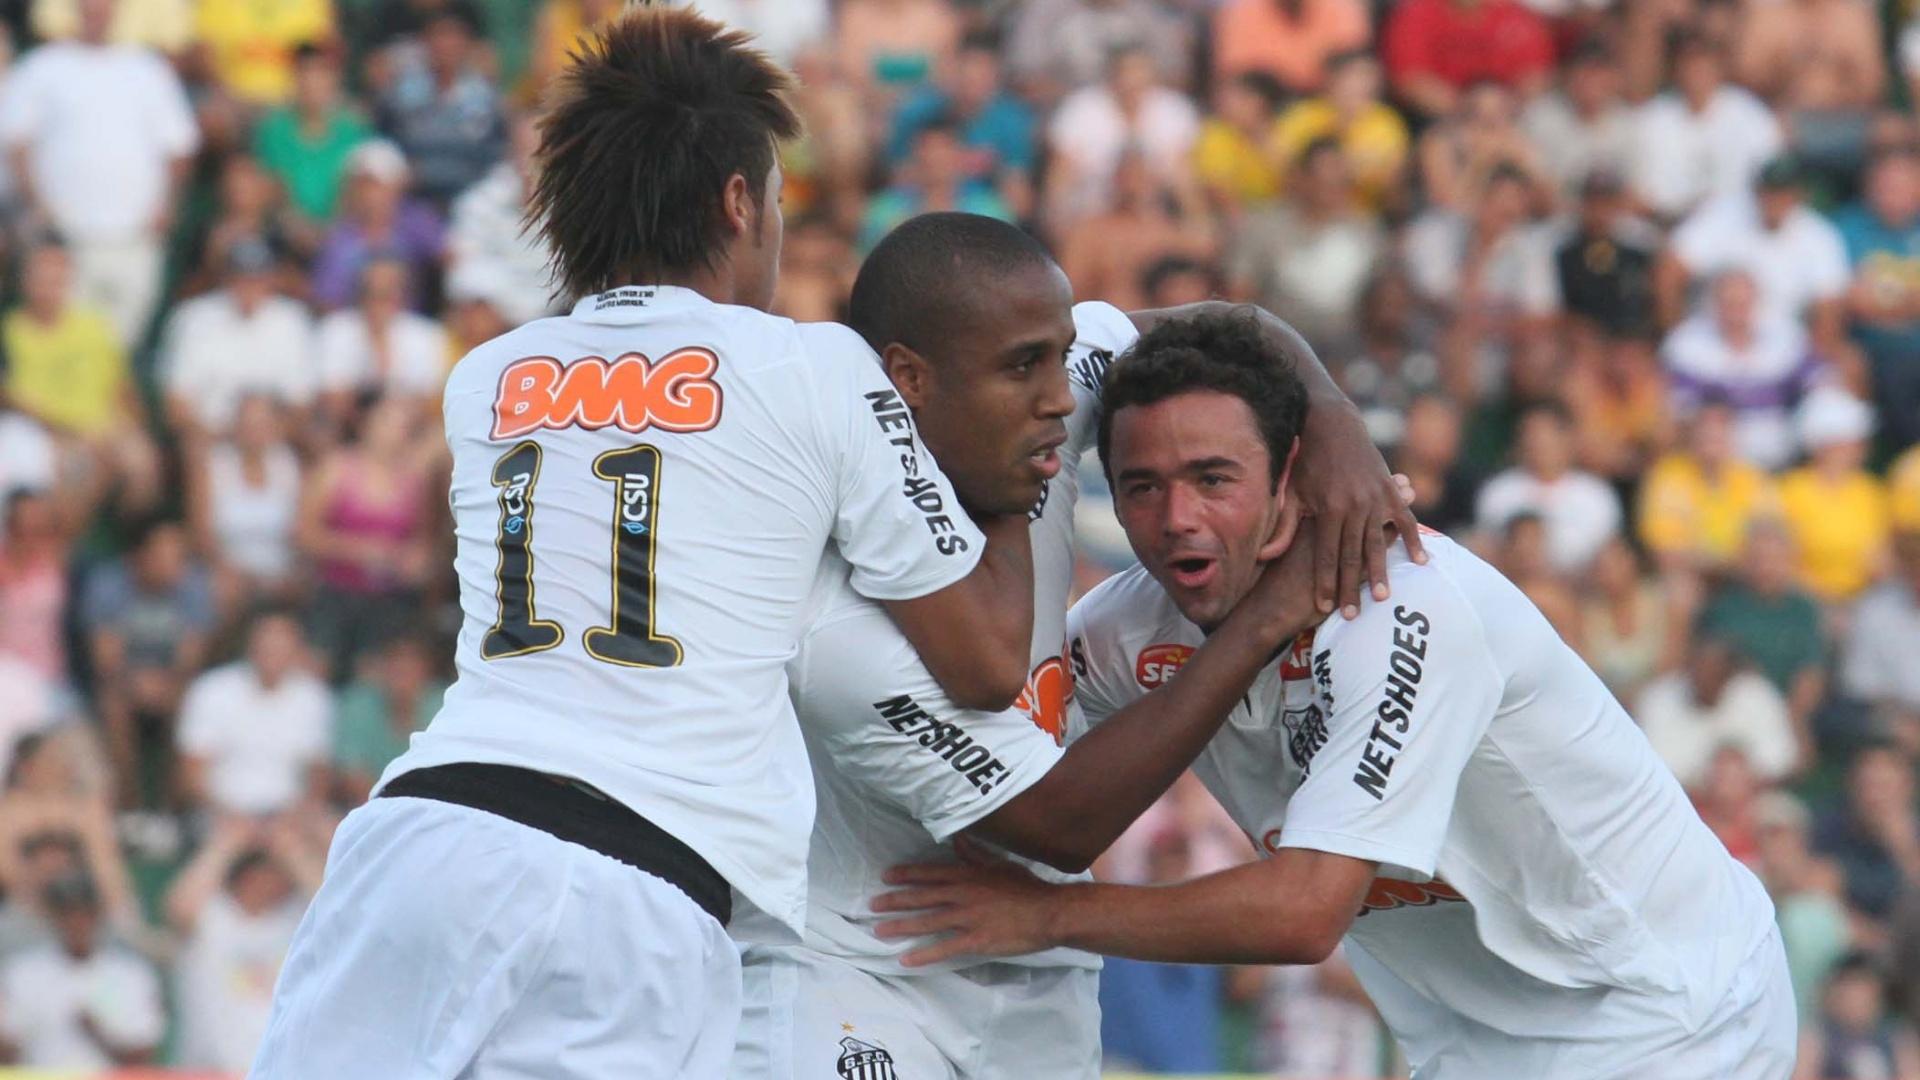 Juan comemora gol marcado diante do Mirassol